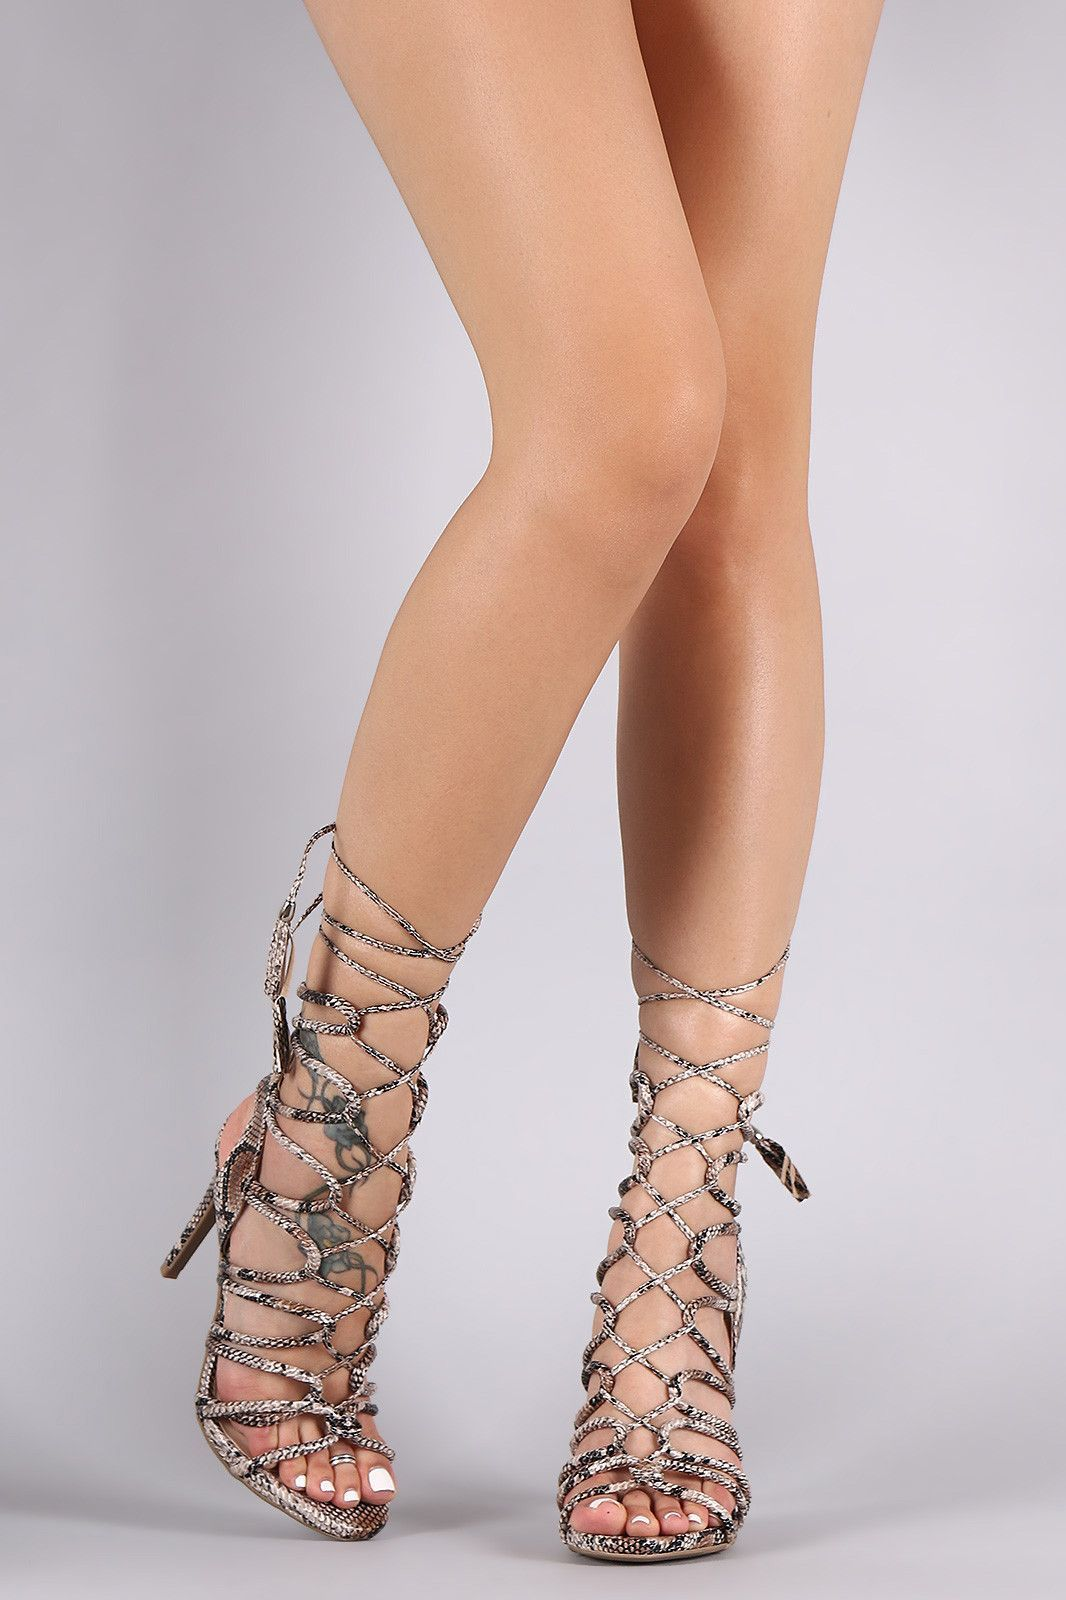 Haute Nude Square Toe Strappy Lace Up Heels   Public